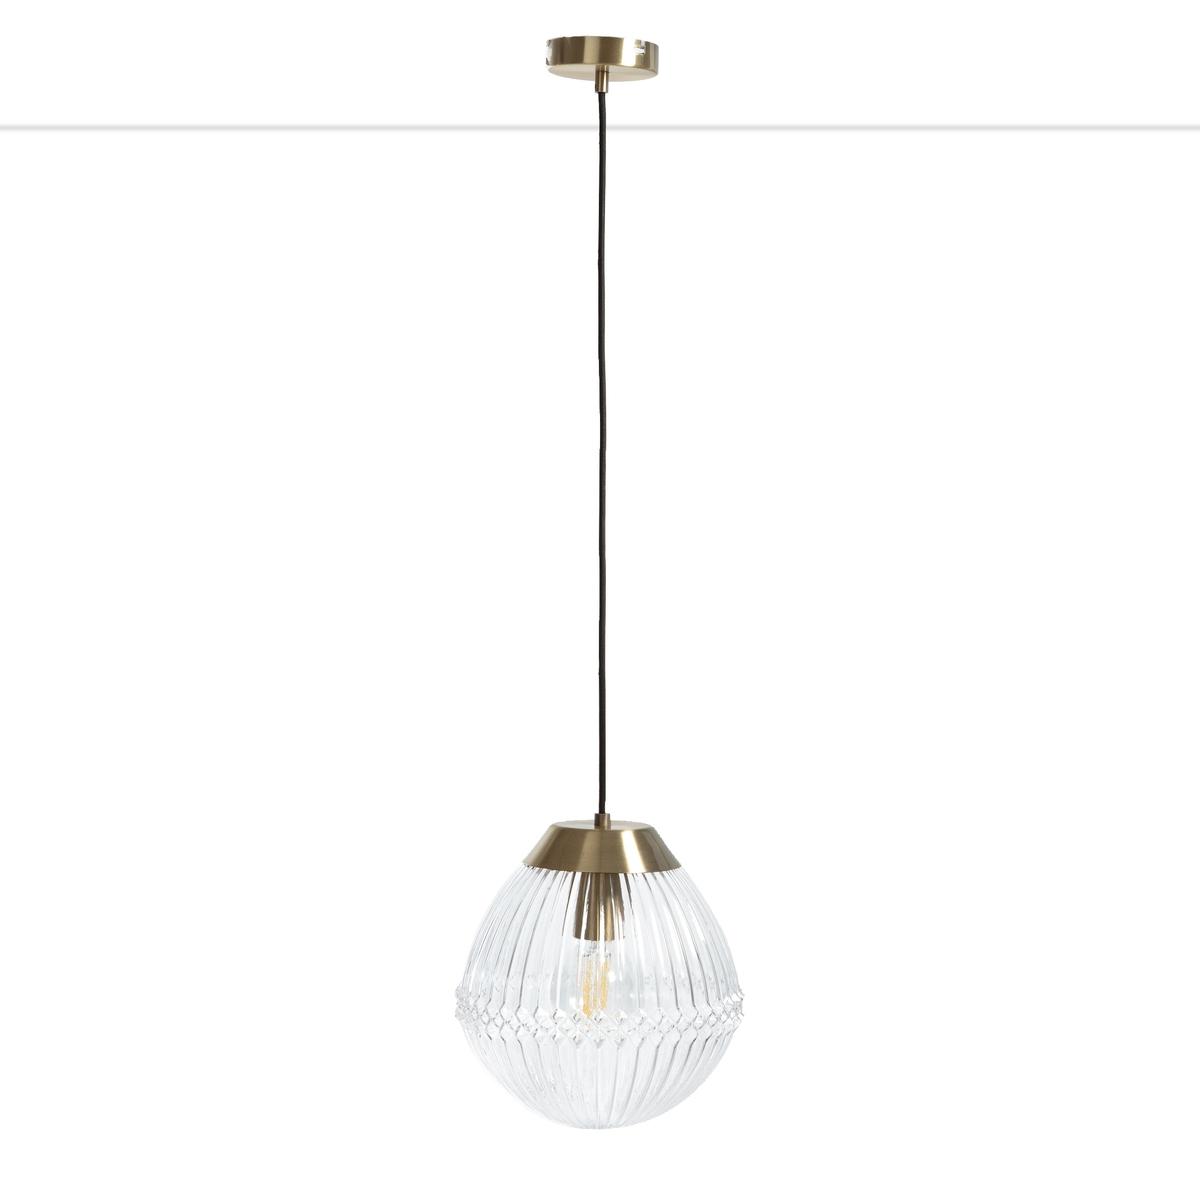 Ari Vintage Pendant Ceiling Light In Brass & Ribbed Glass